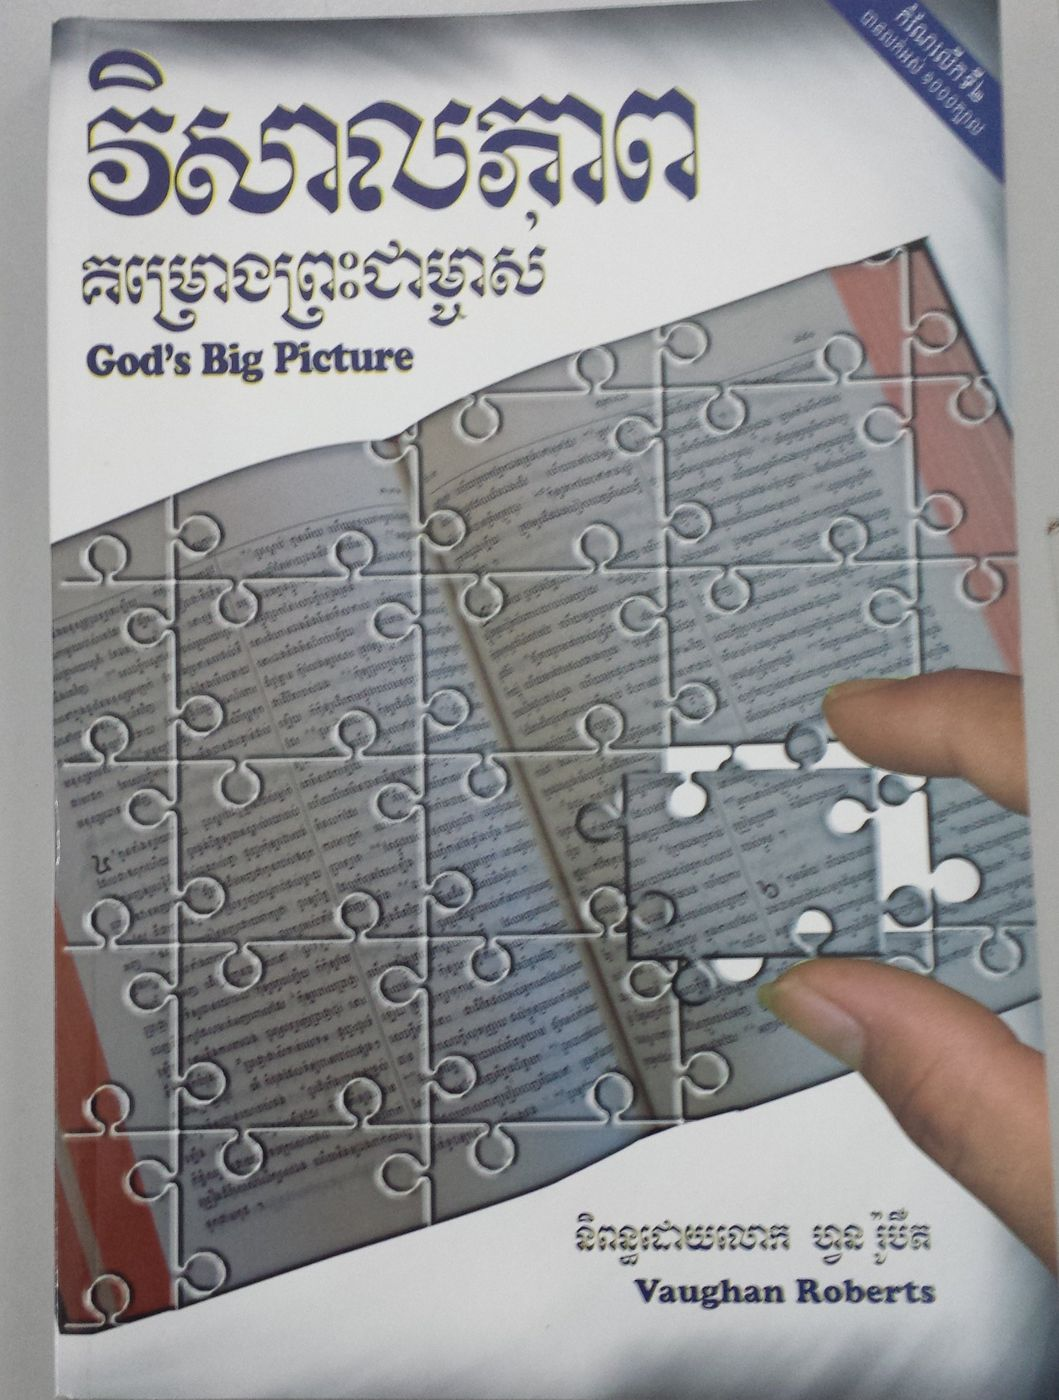 God's Big Picture (blog)